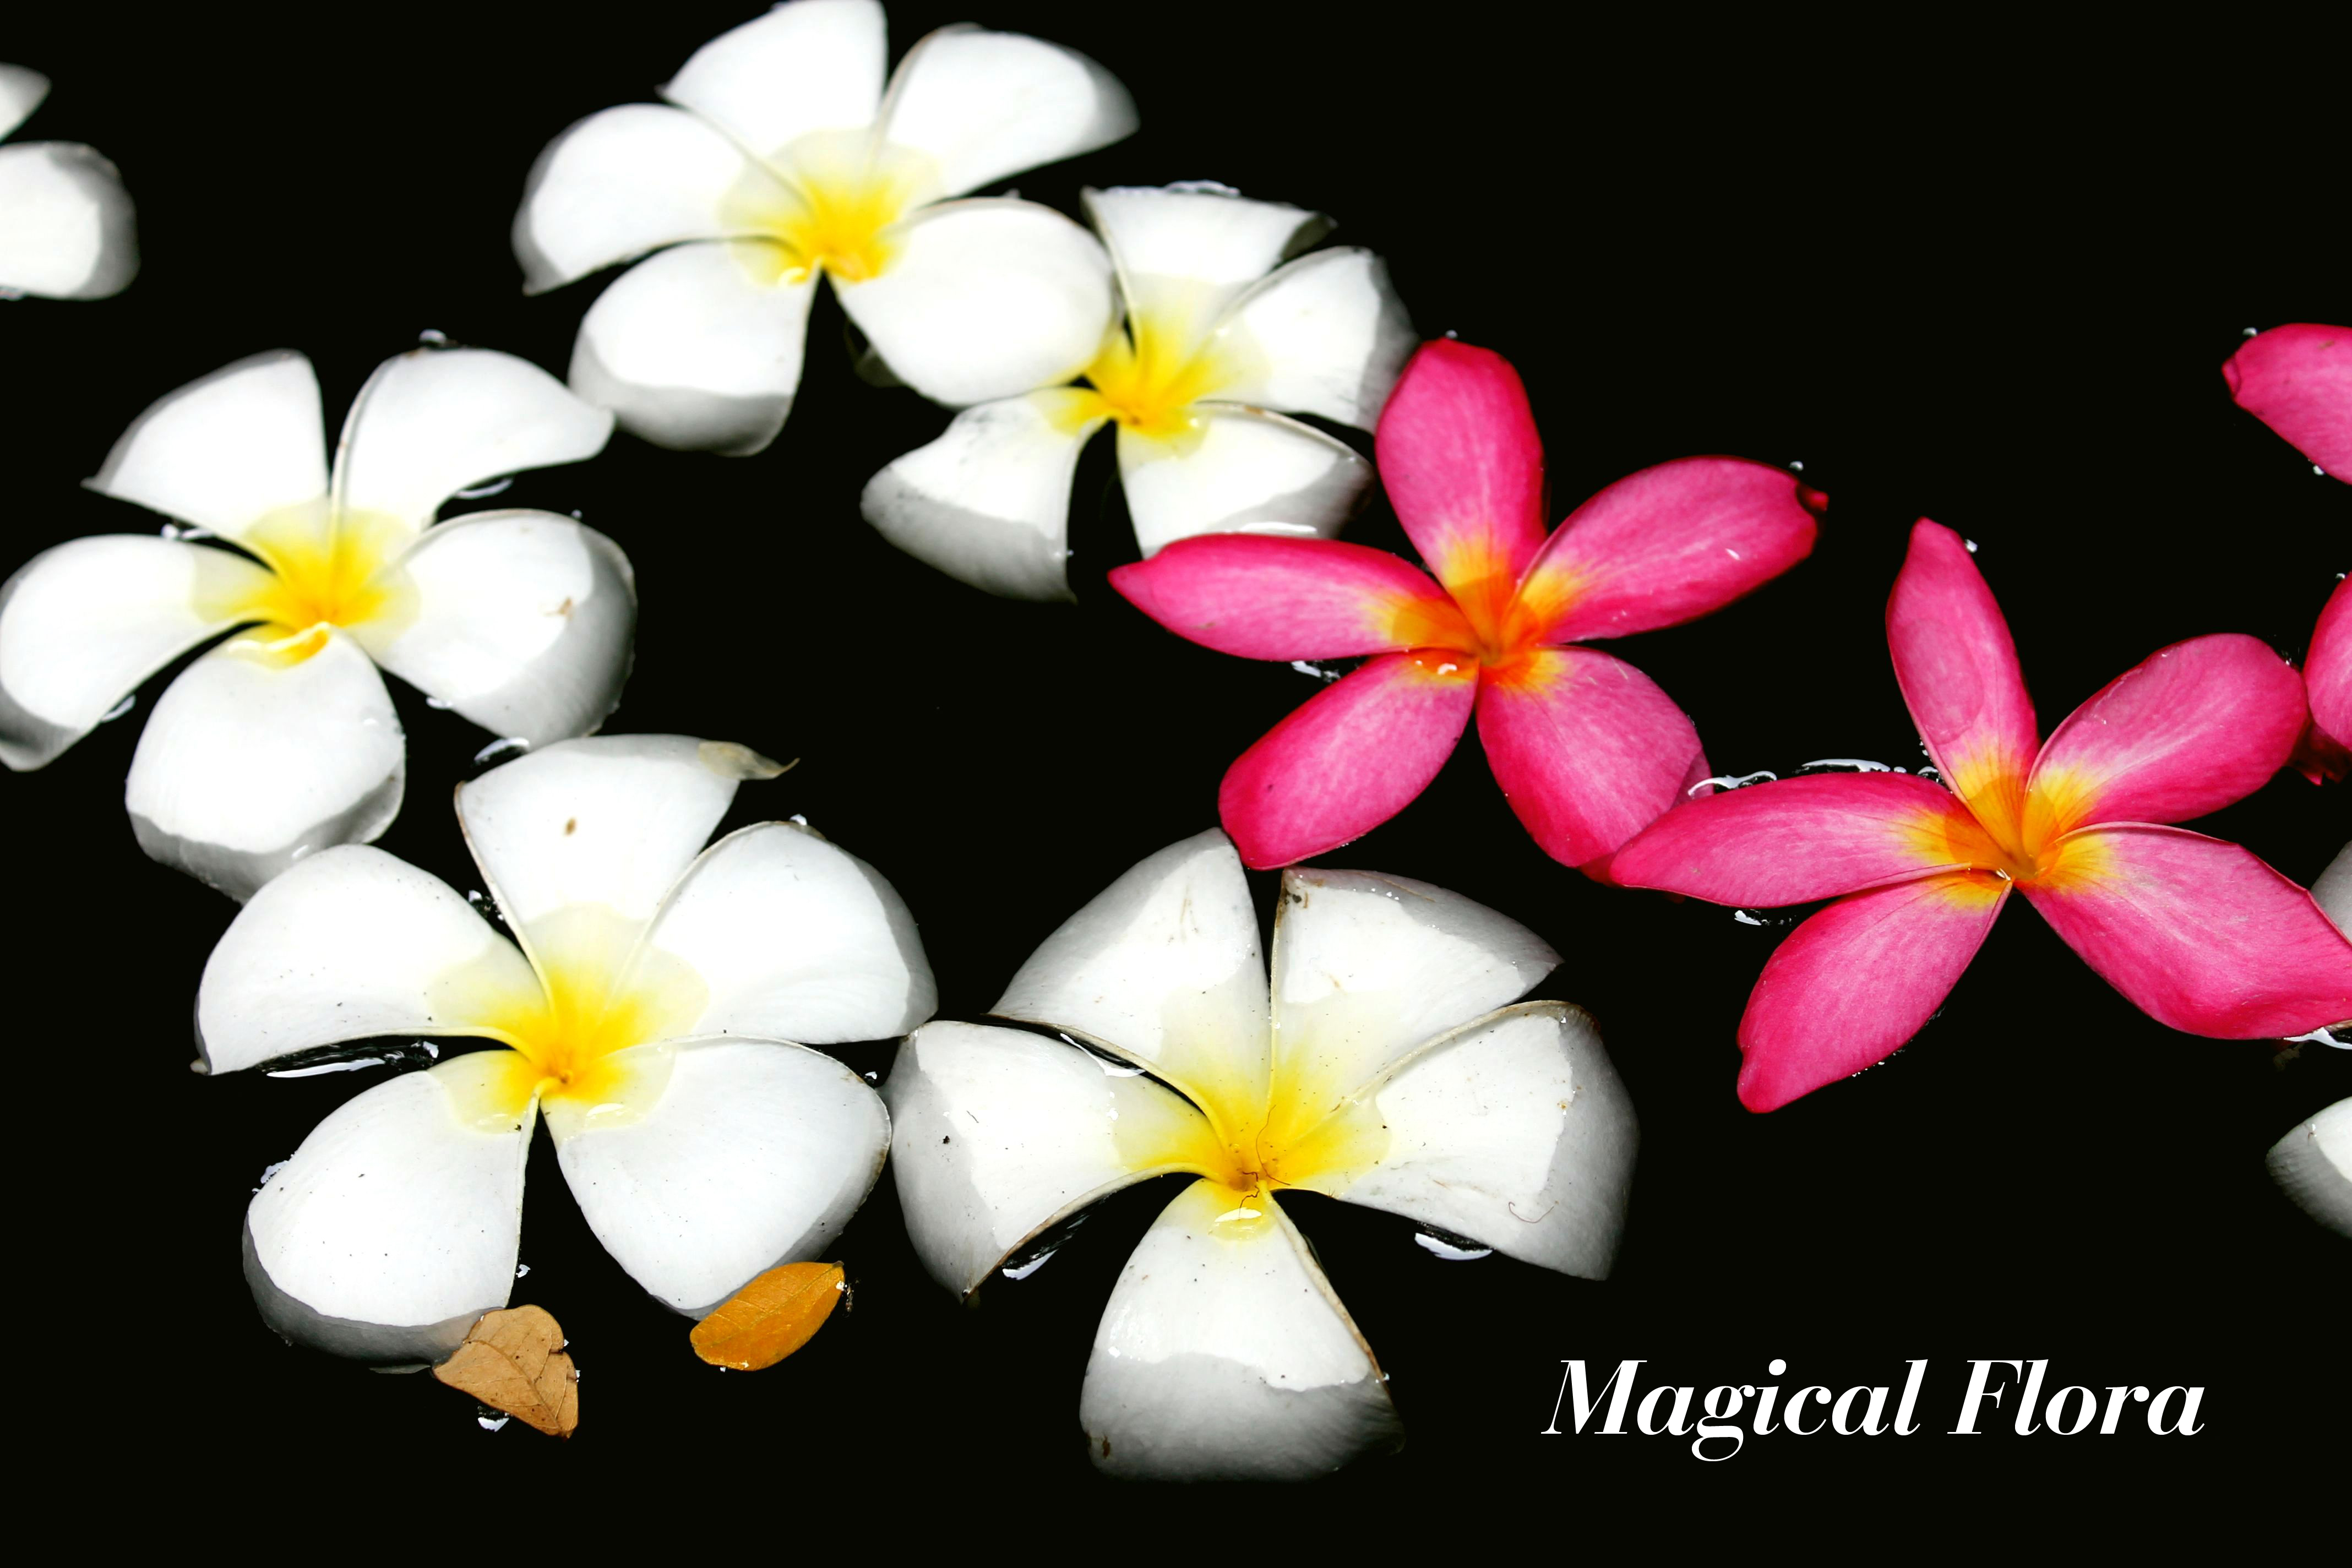 Magical Flora.JPG